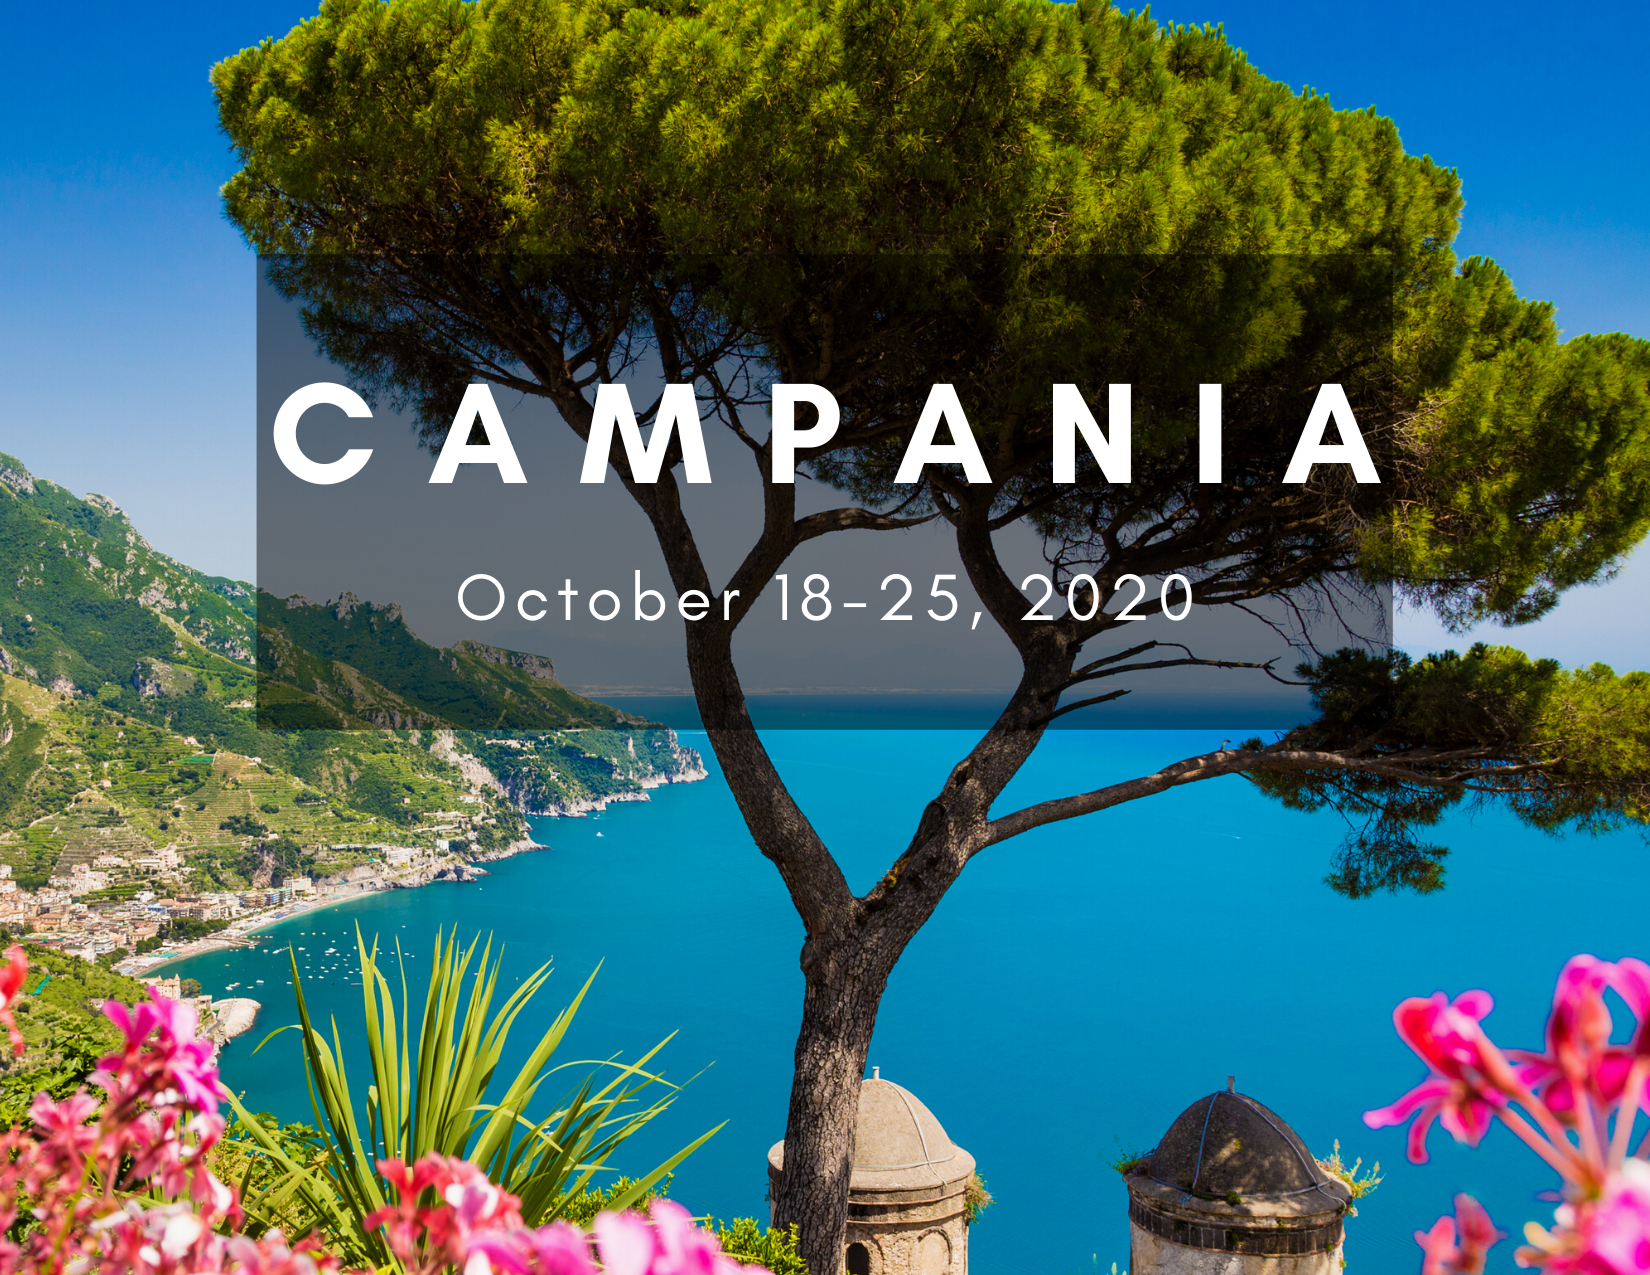 Campania tile.png